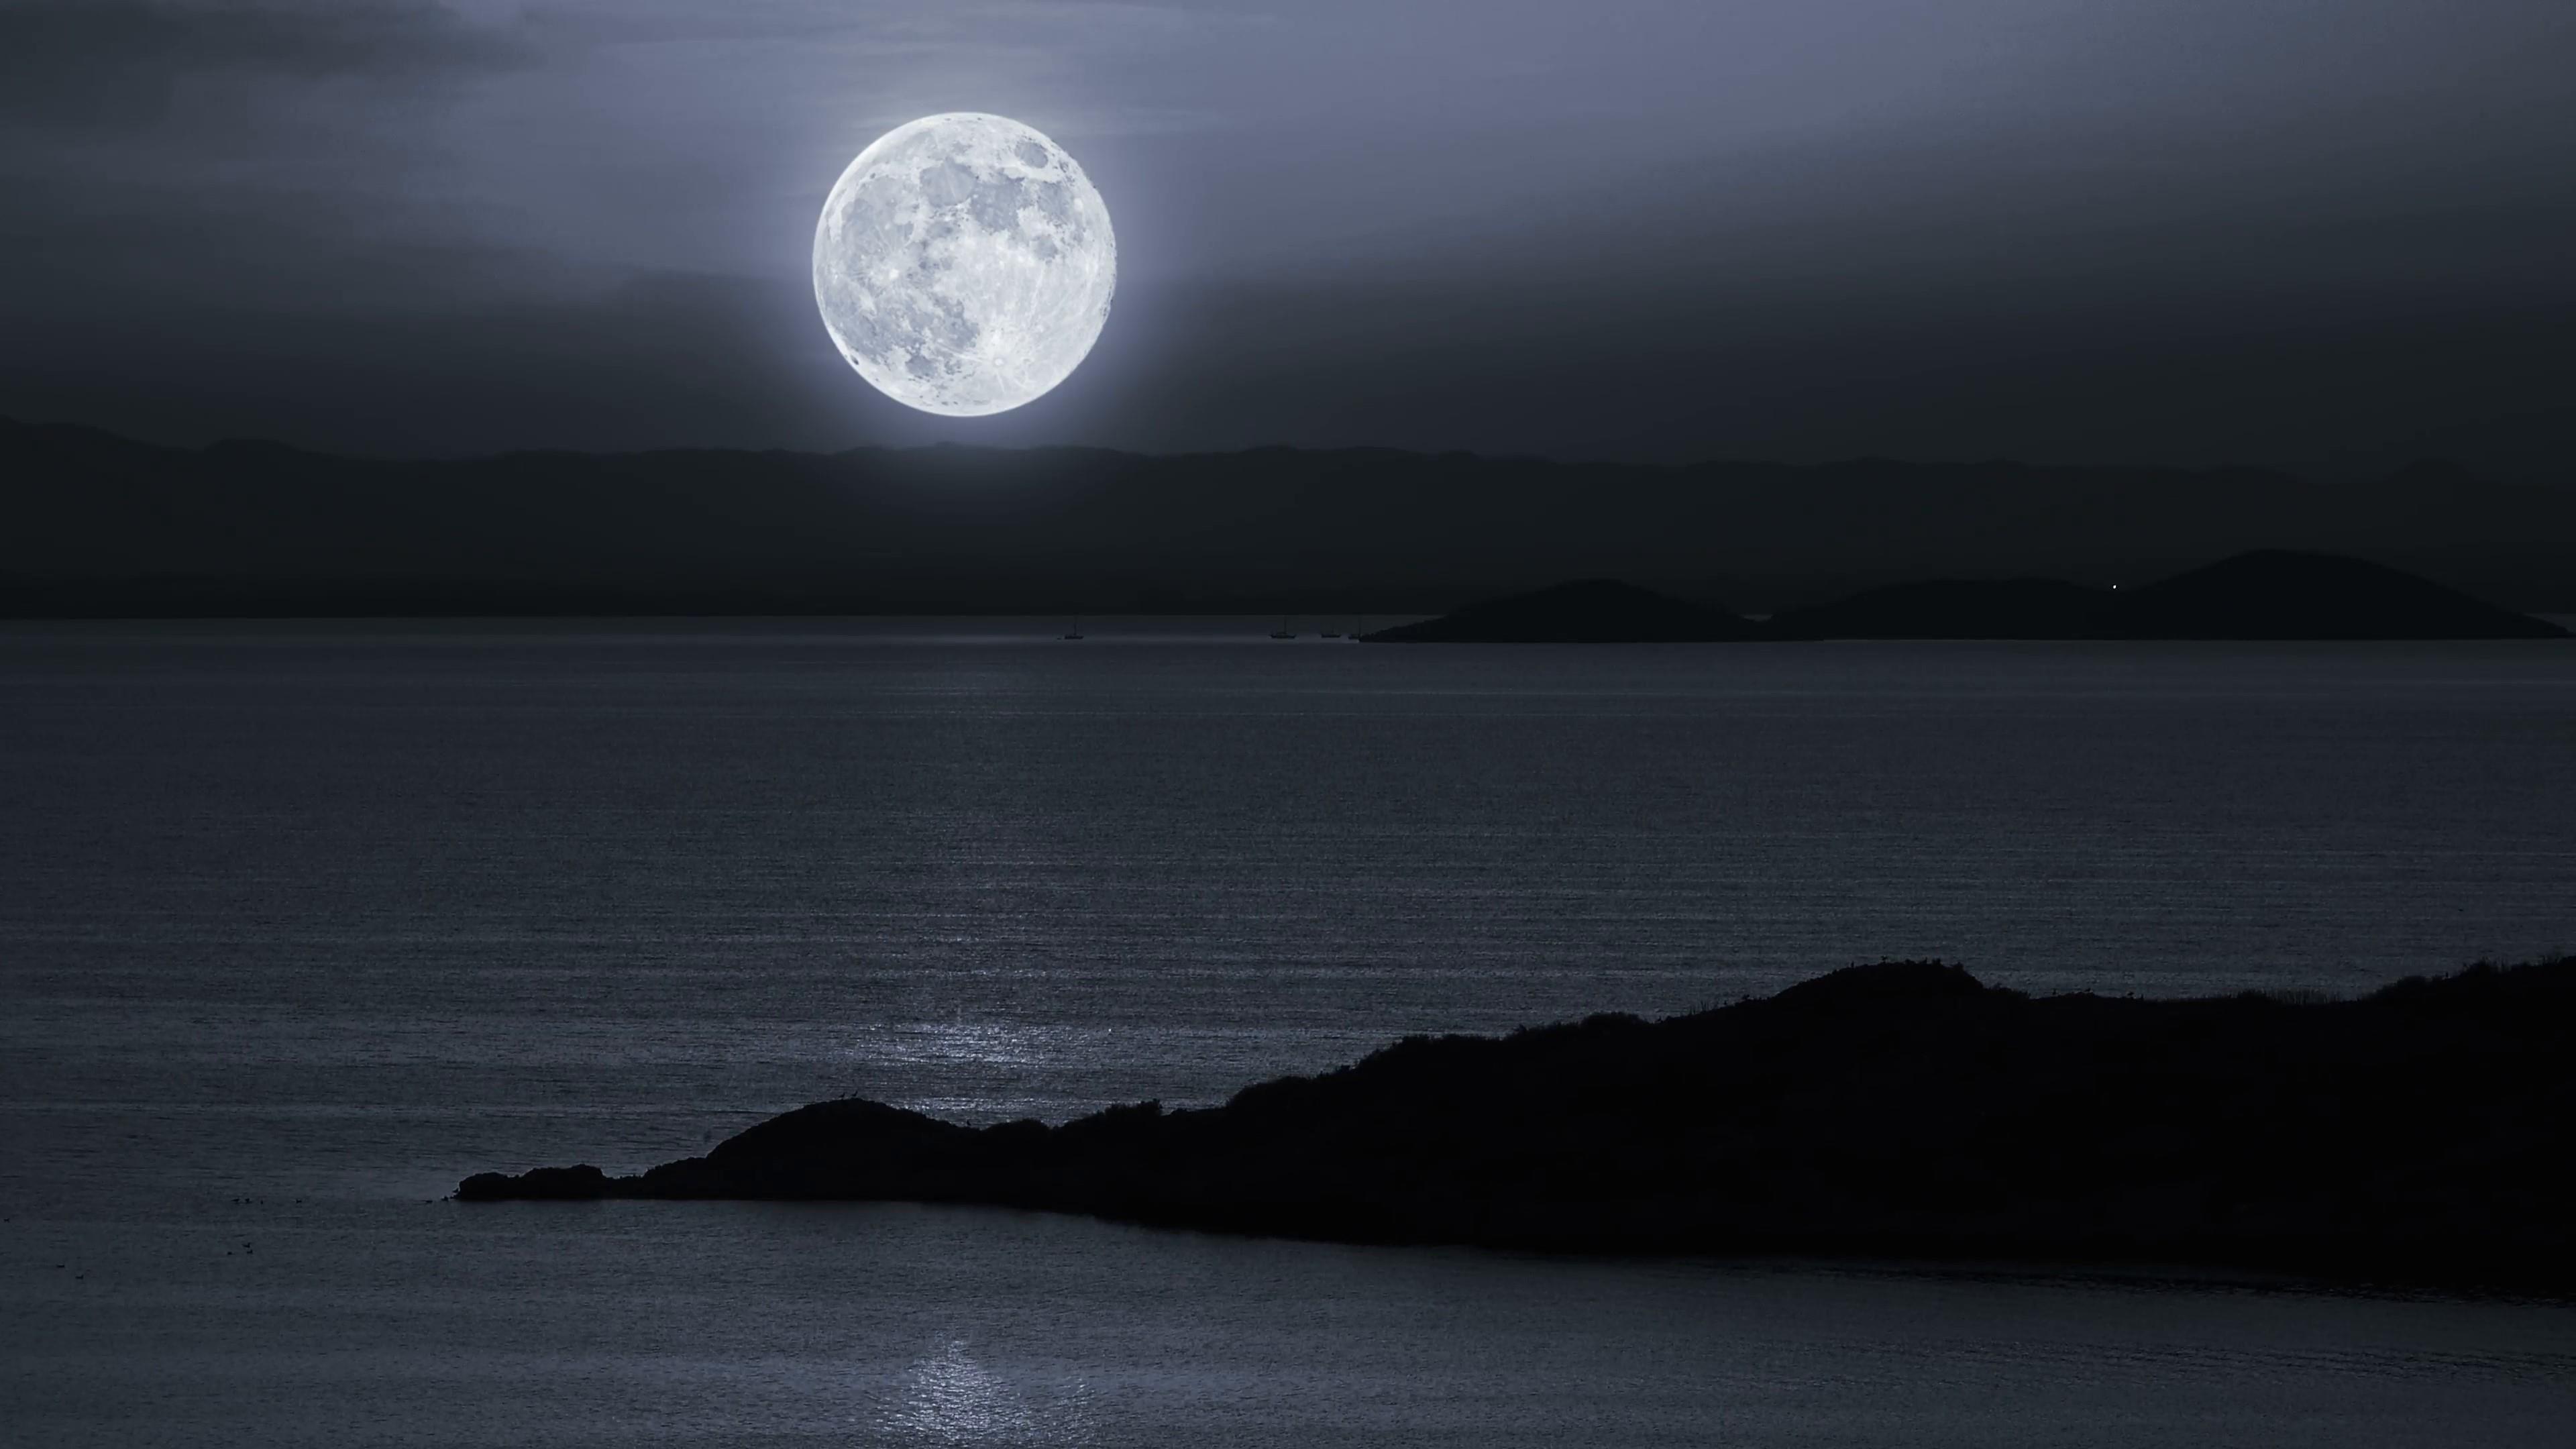 луна и море фото картинки моделями знакомыми ранее